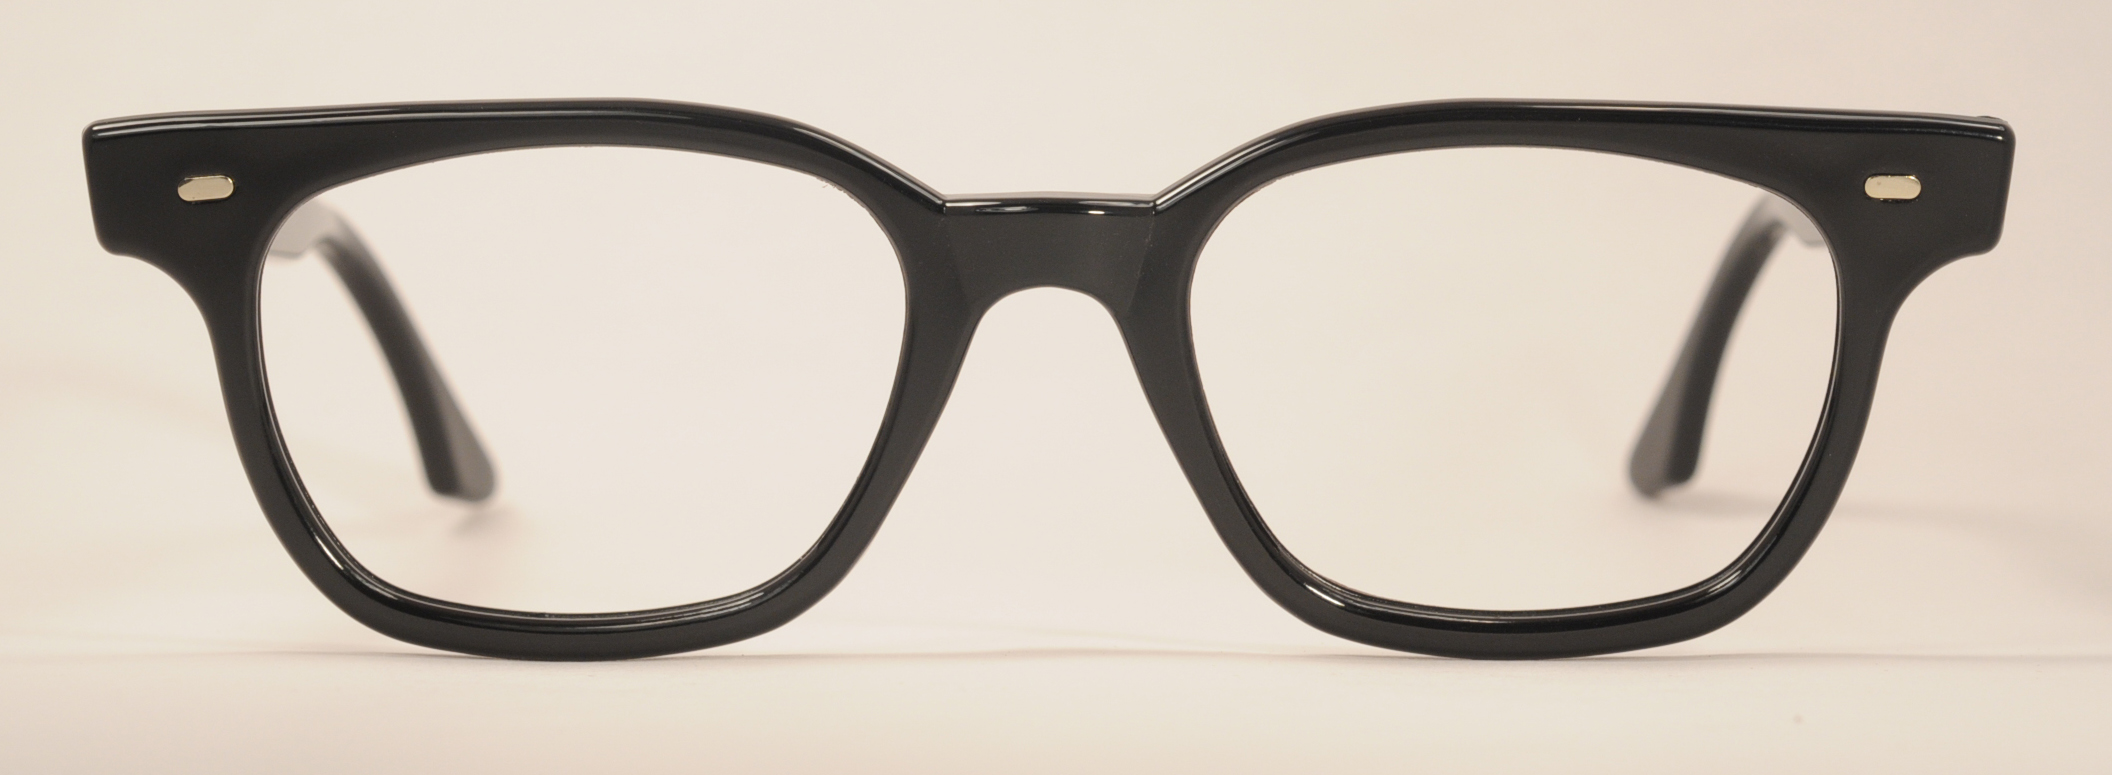 Optometrist Attic - CRISS YANK MENS BLACK PLASTIC HORNRIM ...